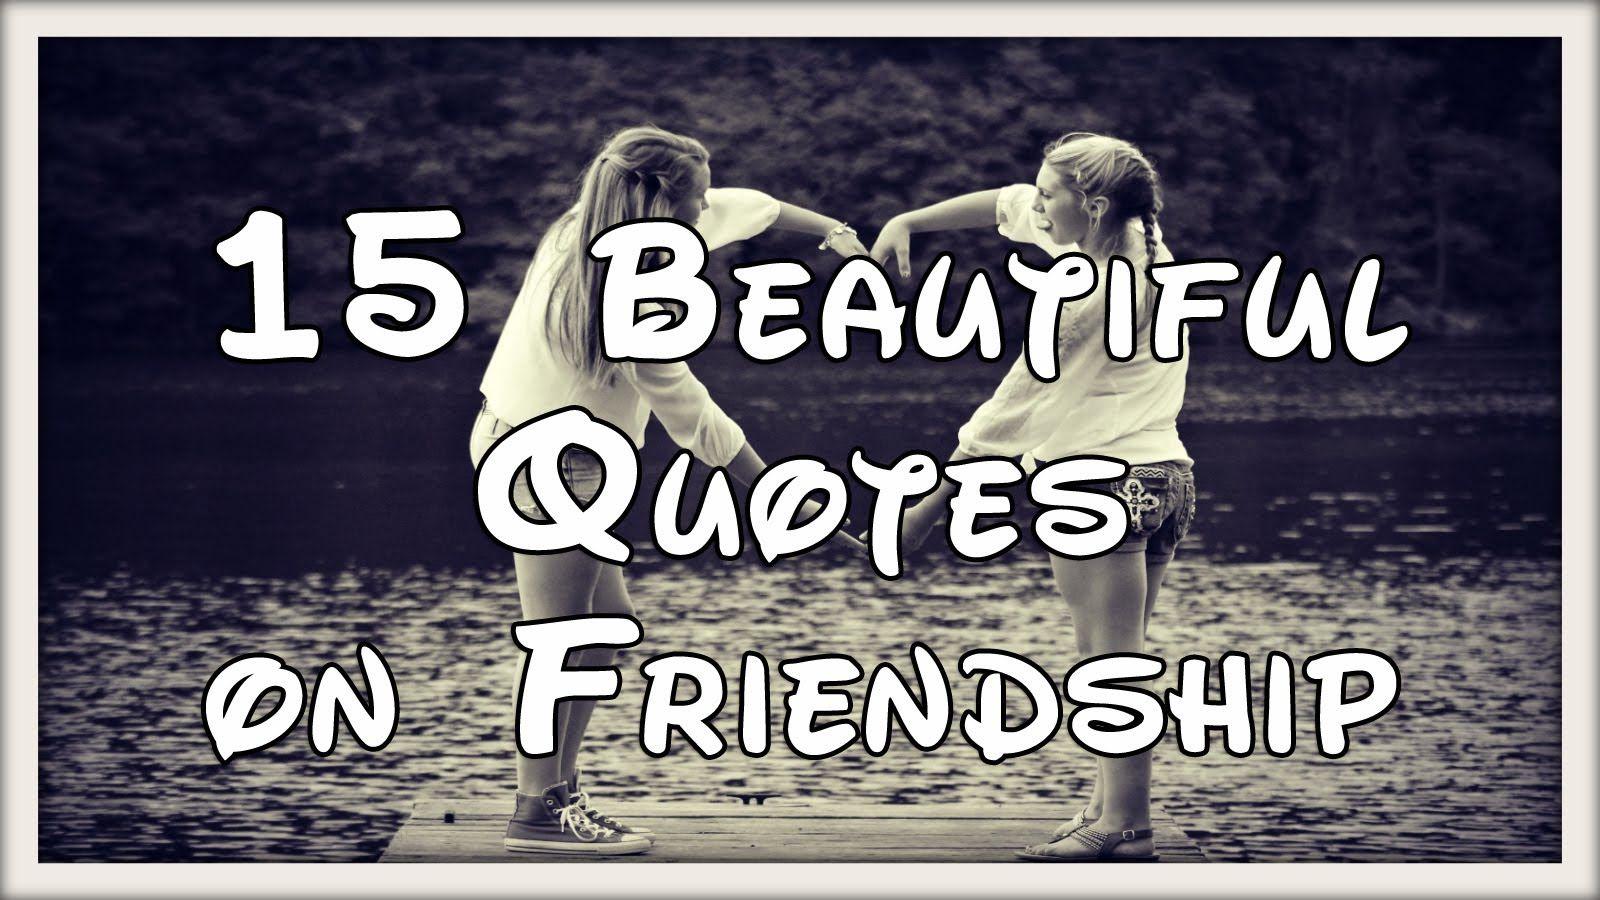 Famous Quotes About Friendship 15 Beautiful Friendship Quotes Johneckstine  My Favorite Quotes